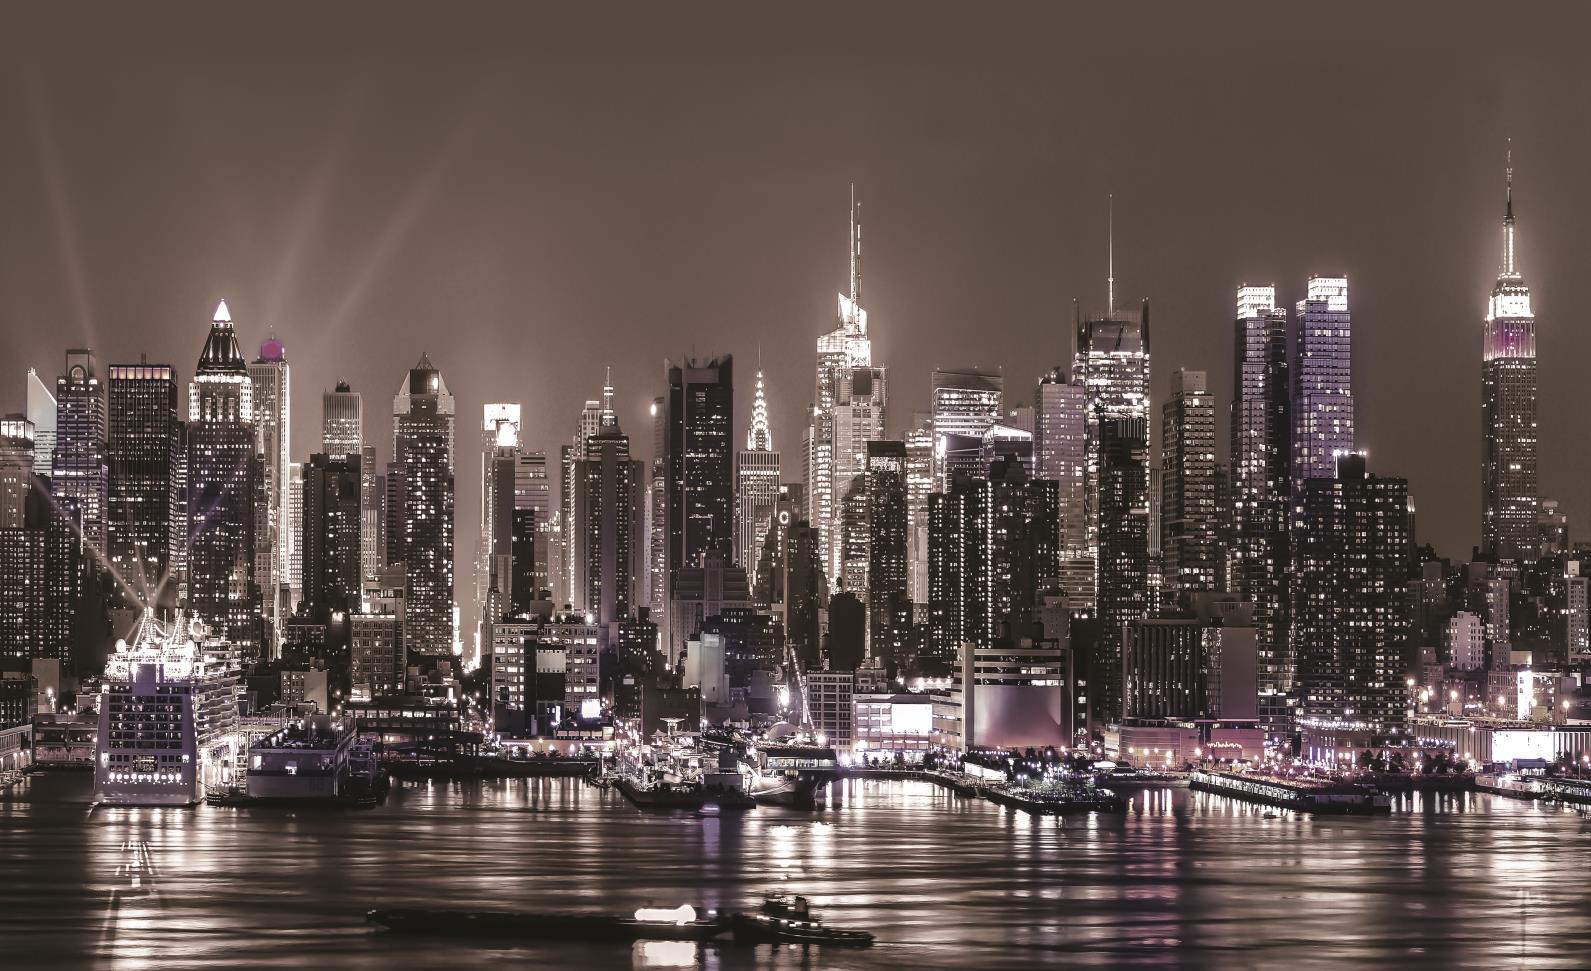 New York City Skyline Urban PHOTO WALLPAPER WALL MURAL PICTURE 1311P 1591x971